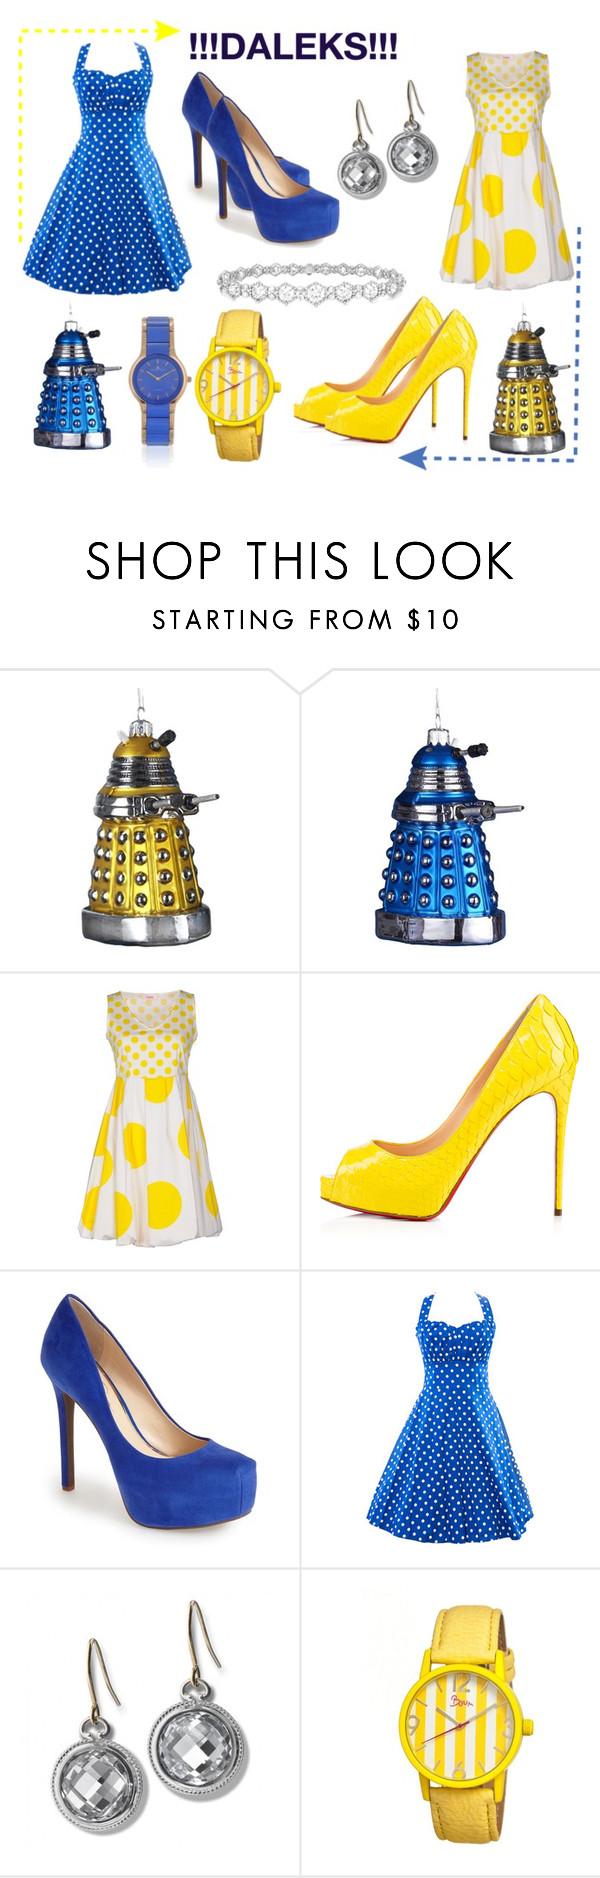 """Dalek's and Beyond"" by marthabr on Polyvore featuring Kurt Adler, Blugirl Folies, Privé, Jessica Simpson, Monica Rich Kosann, Epoque, Boum and Jacques Lemans"